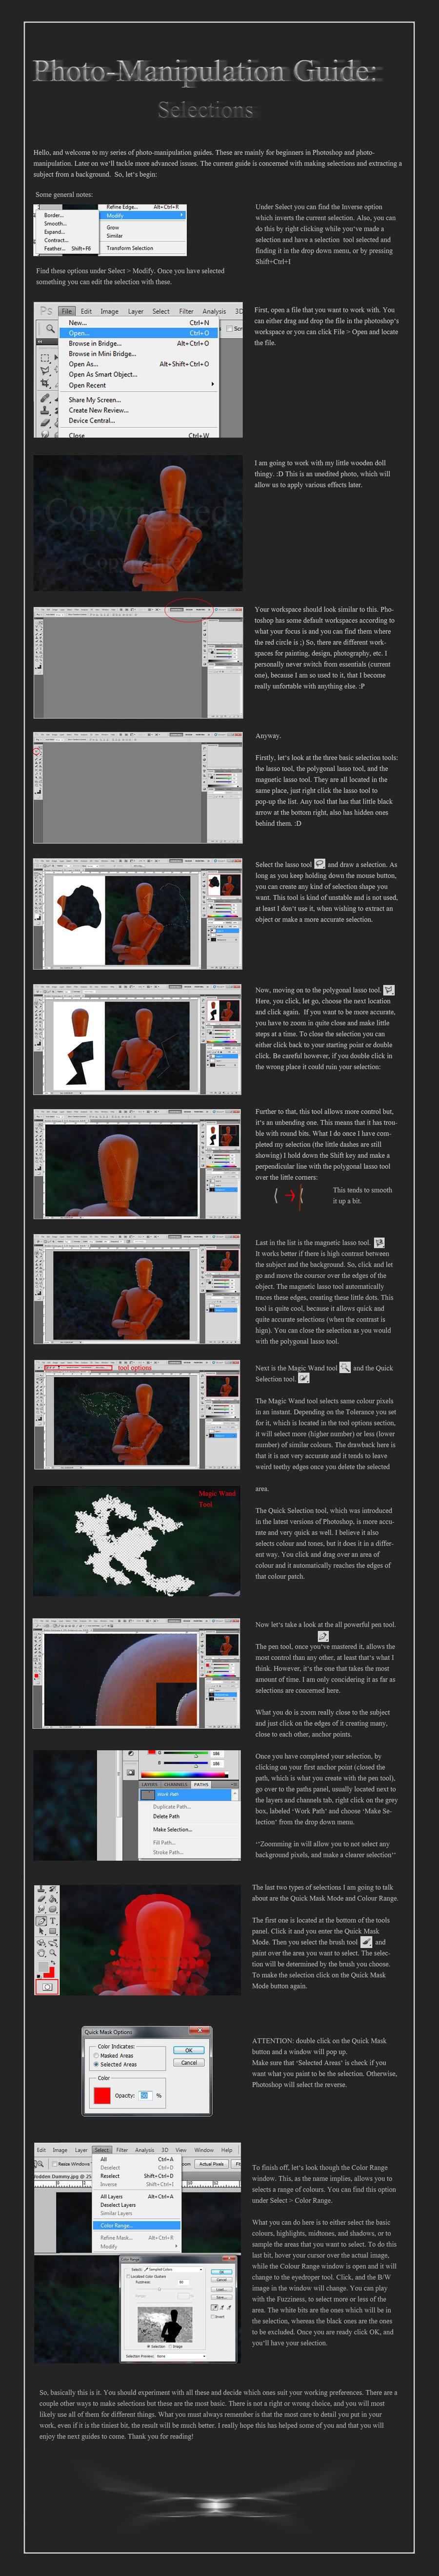 Photo-Manipulation Guide 1 by Serkenil